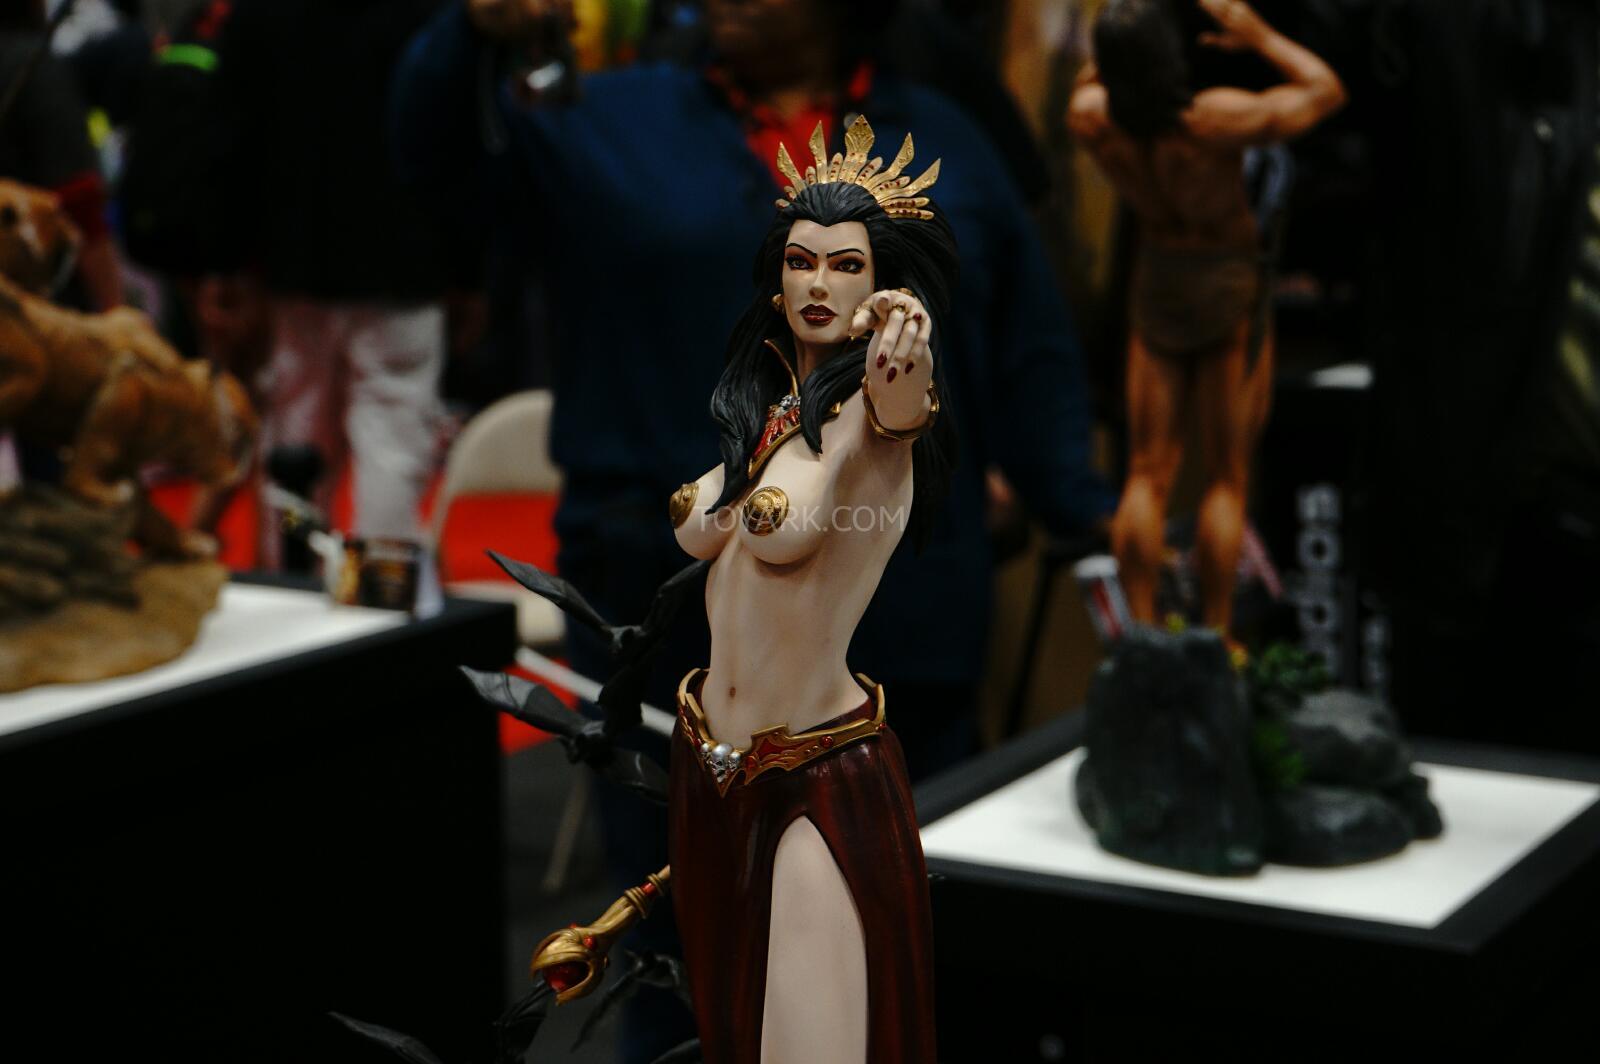 [ARH Studios] New Queen of Vampires 1/4 Scale Statue - Página 2 NYCC-2014-ARH-Studios-015